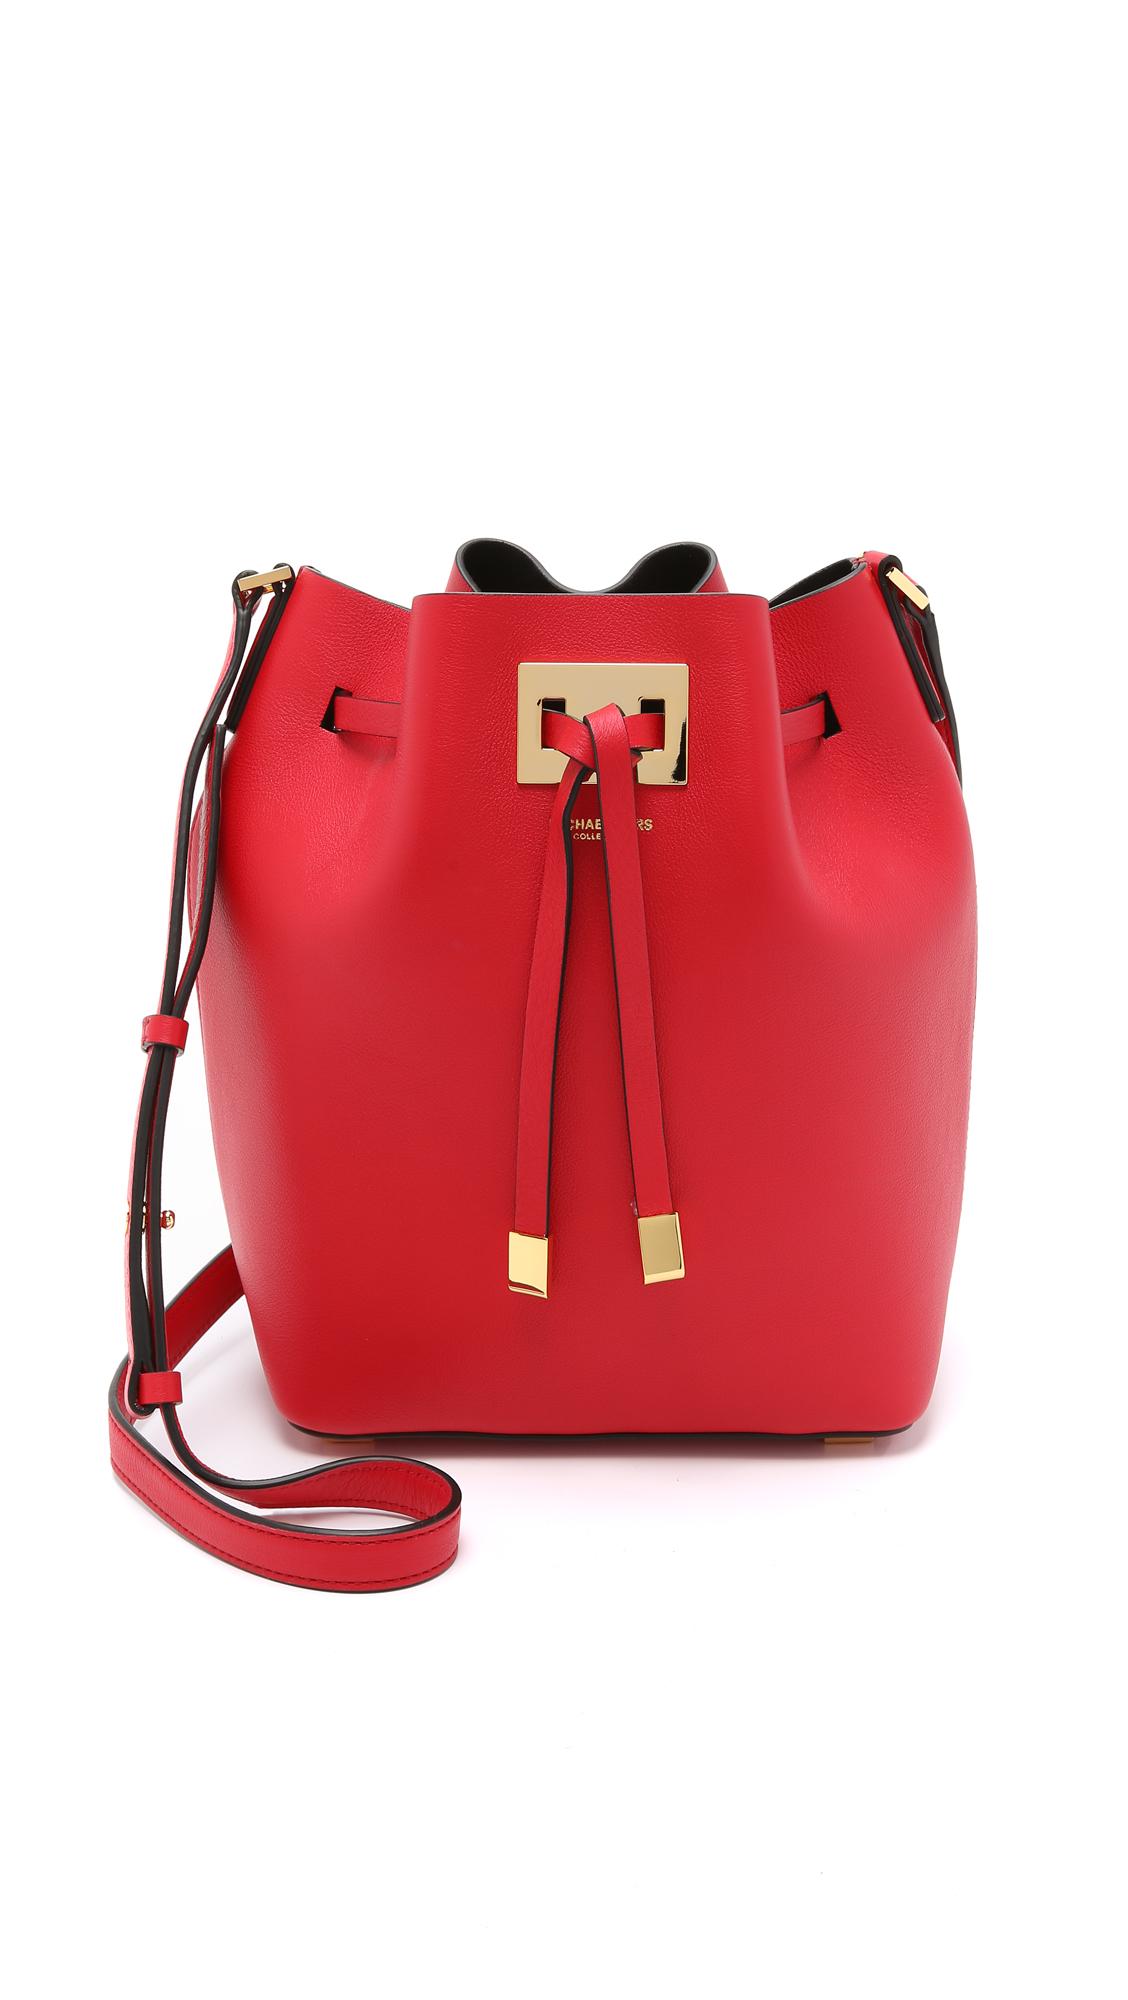 557dbbf50d169 czech lyst michael kors miranda medium drawstring bag crimson in red 45fb0  25811